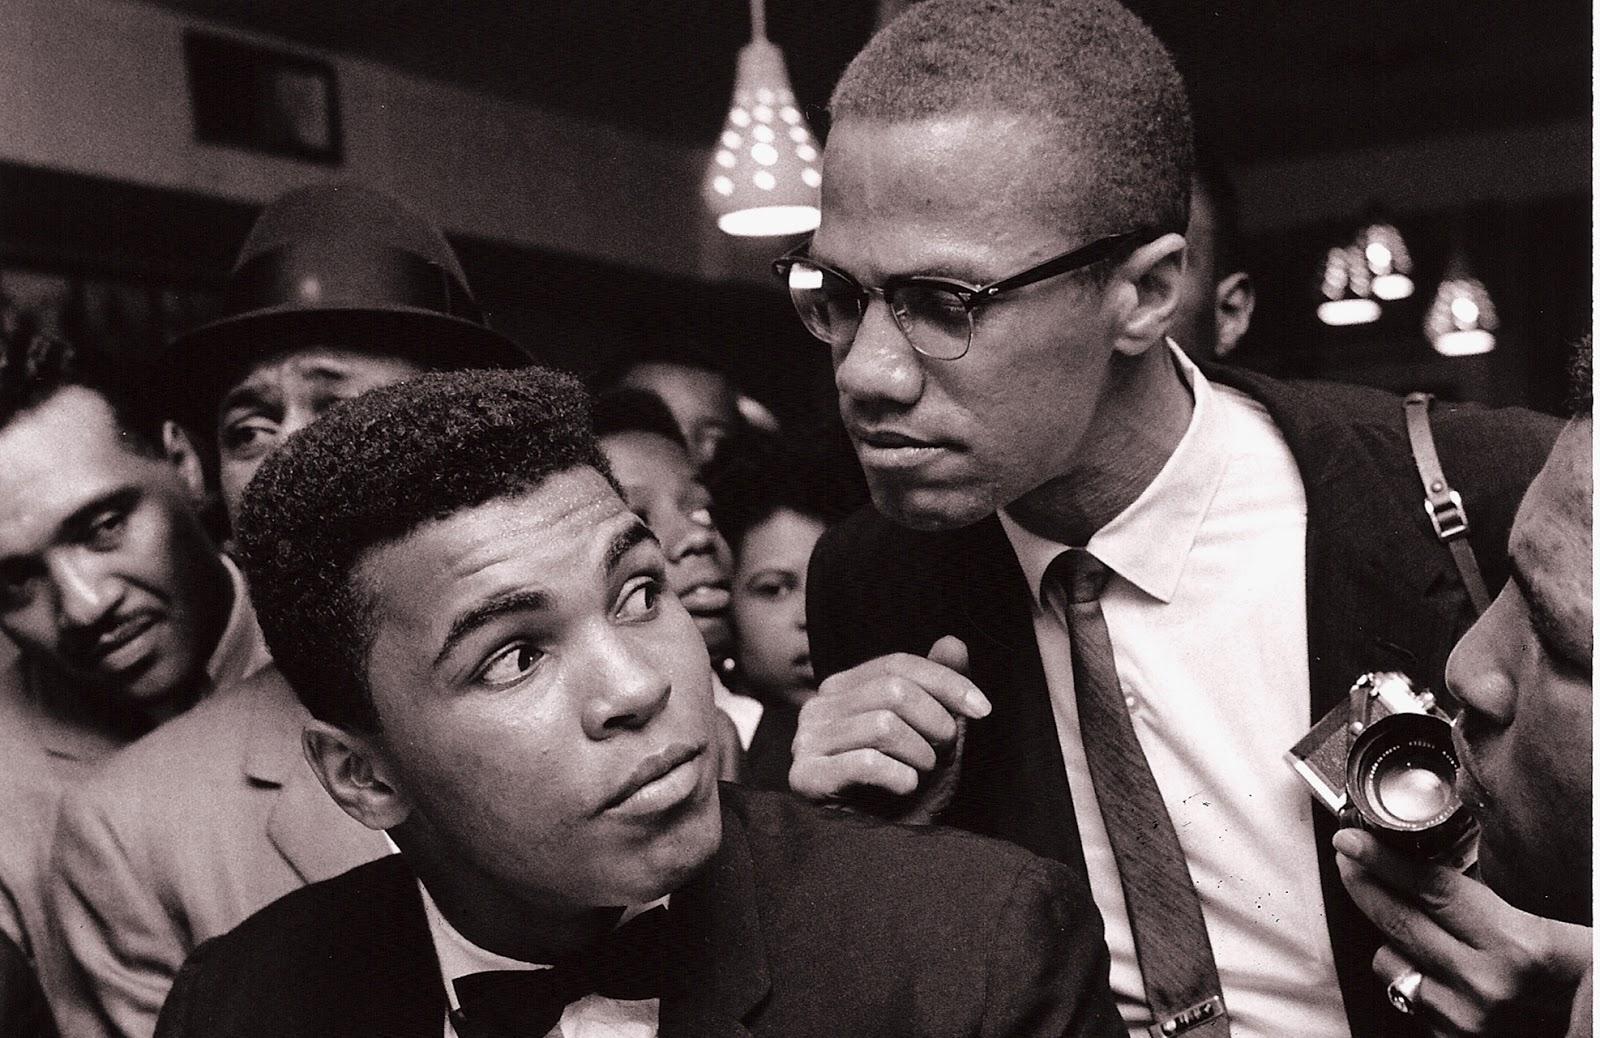 Purgatory G Cat Fish D Dialogue Malcolm X Wikipedia The Free